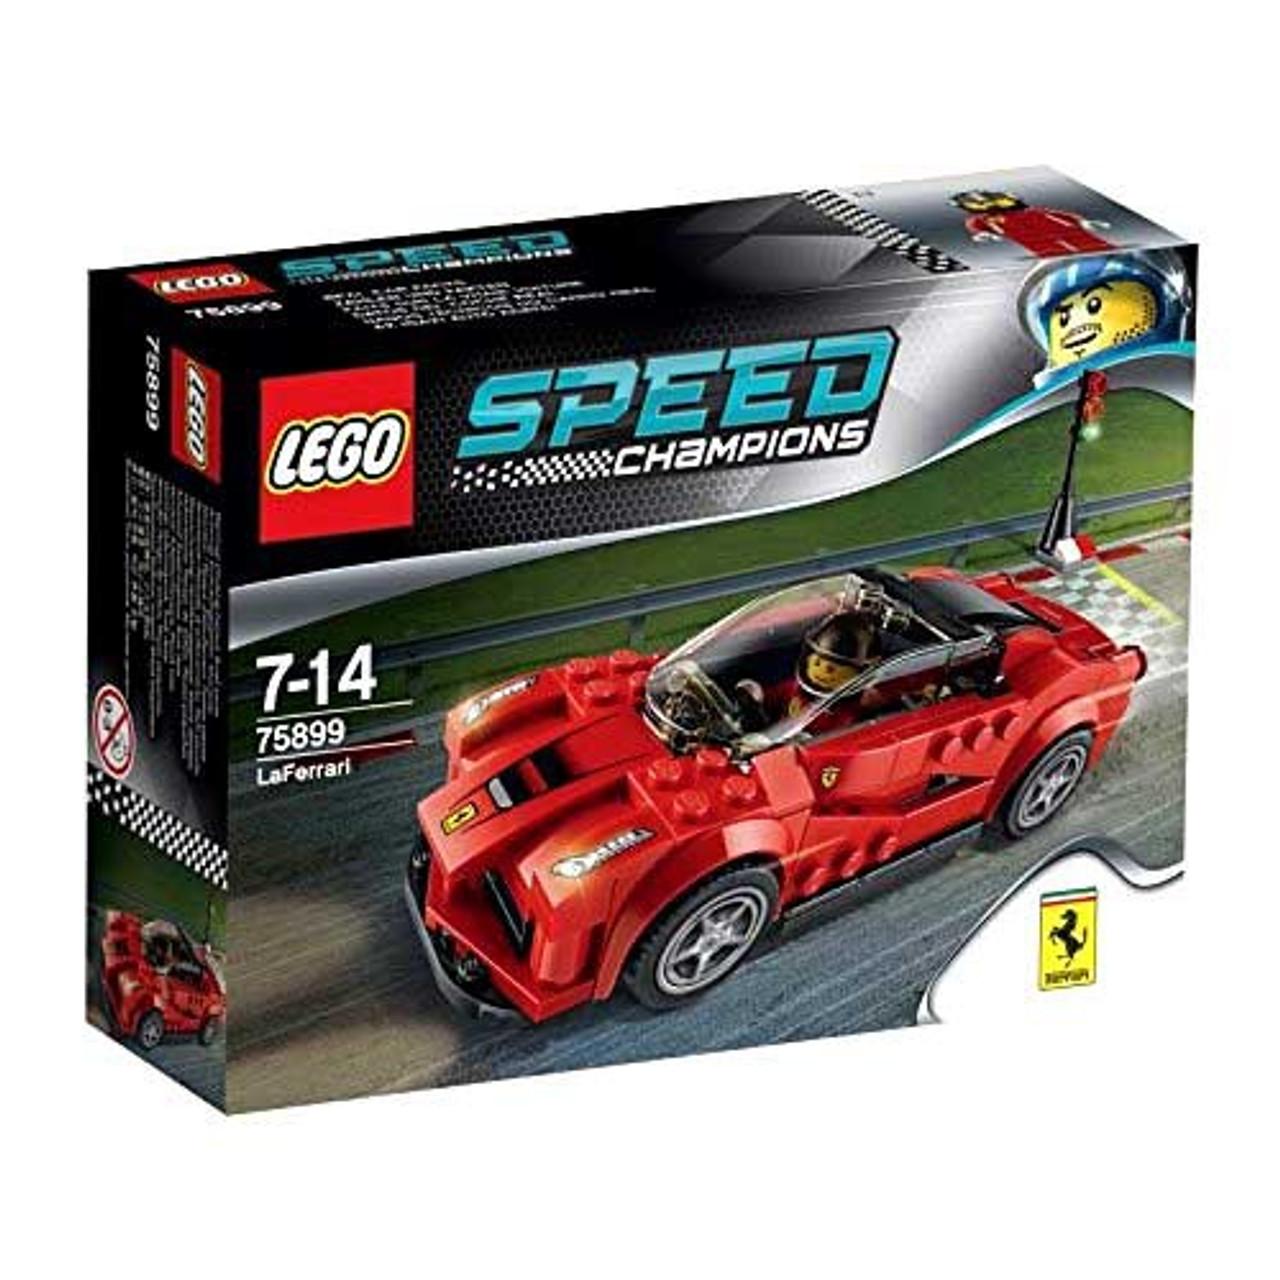 LEGO Speed Champions La Ferrari Set 75899 - ToyWiz